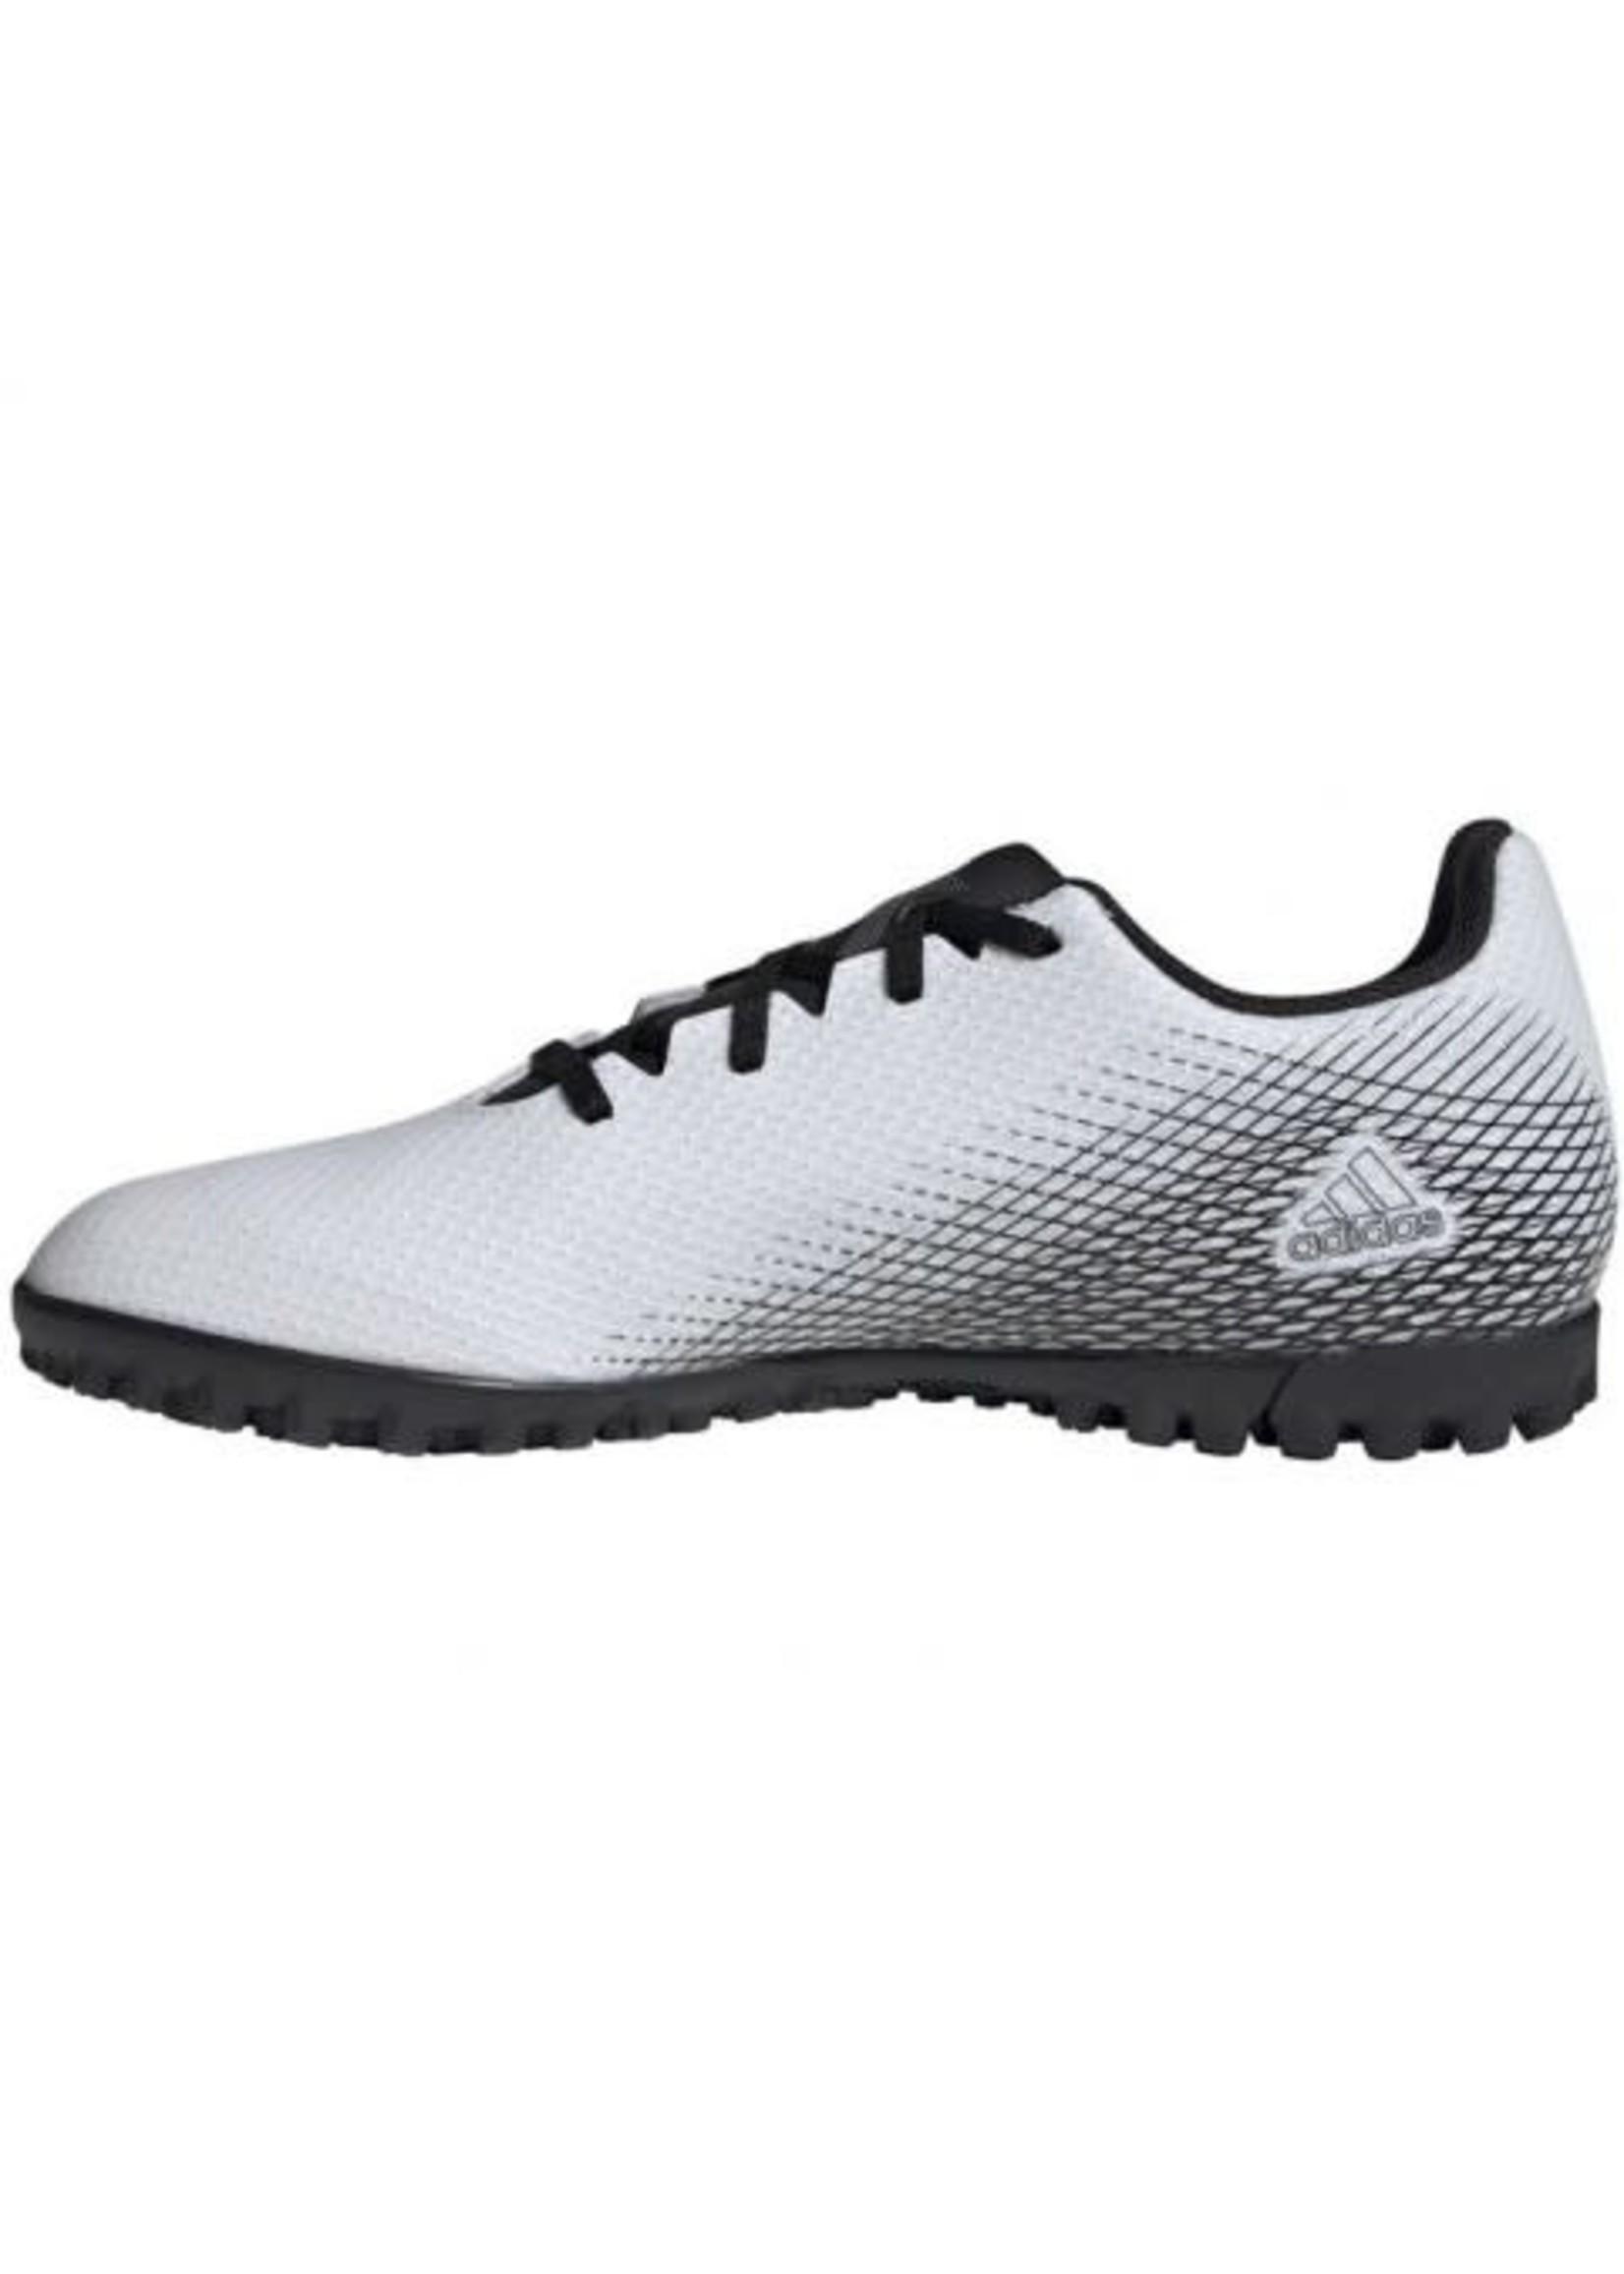 Adidas Adidas X Ghosted.4 Men Turf Shoe (2021) - White / Black